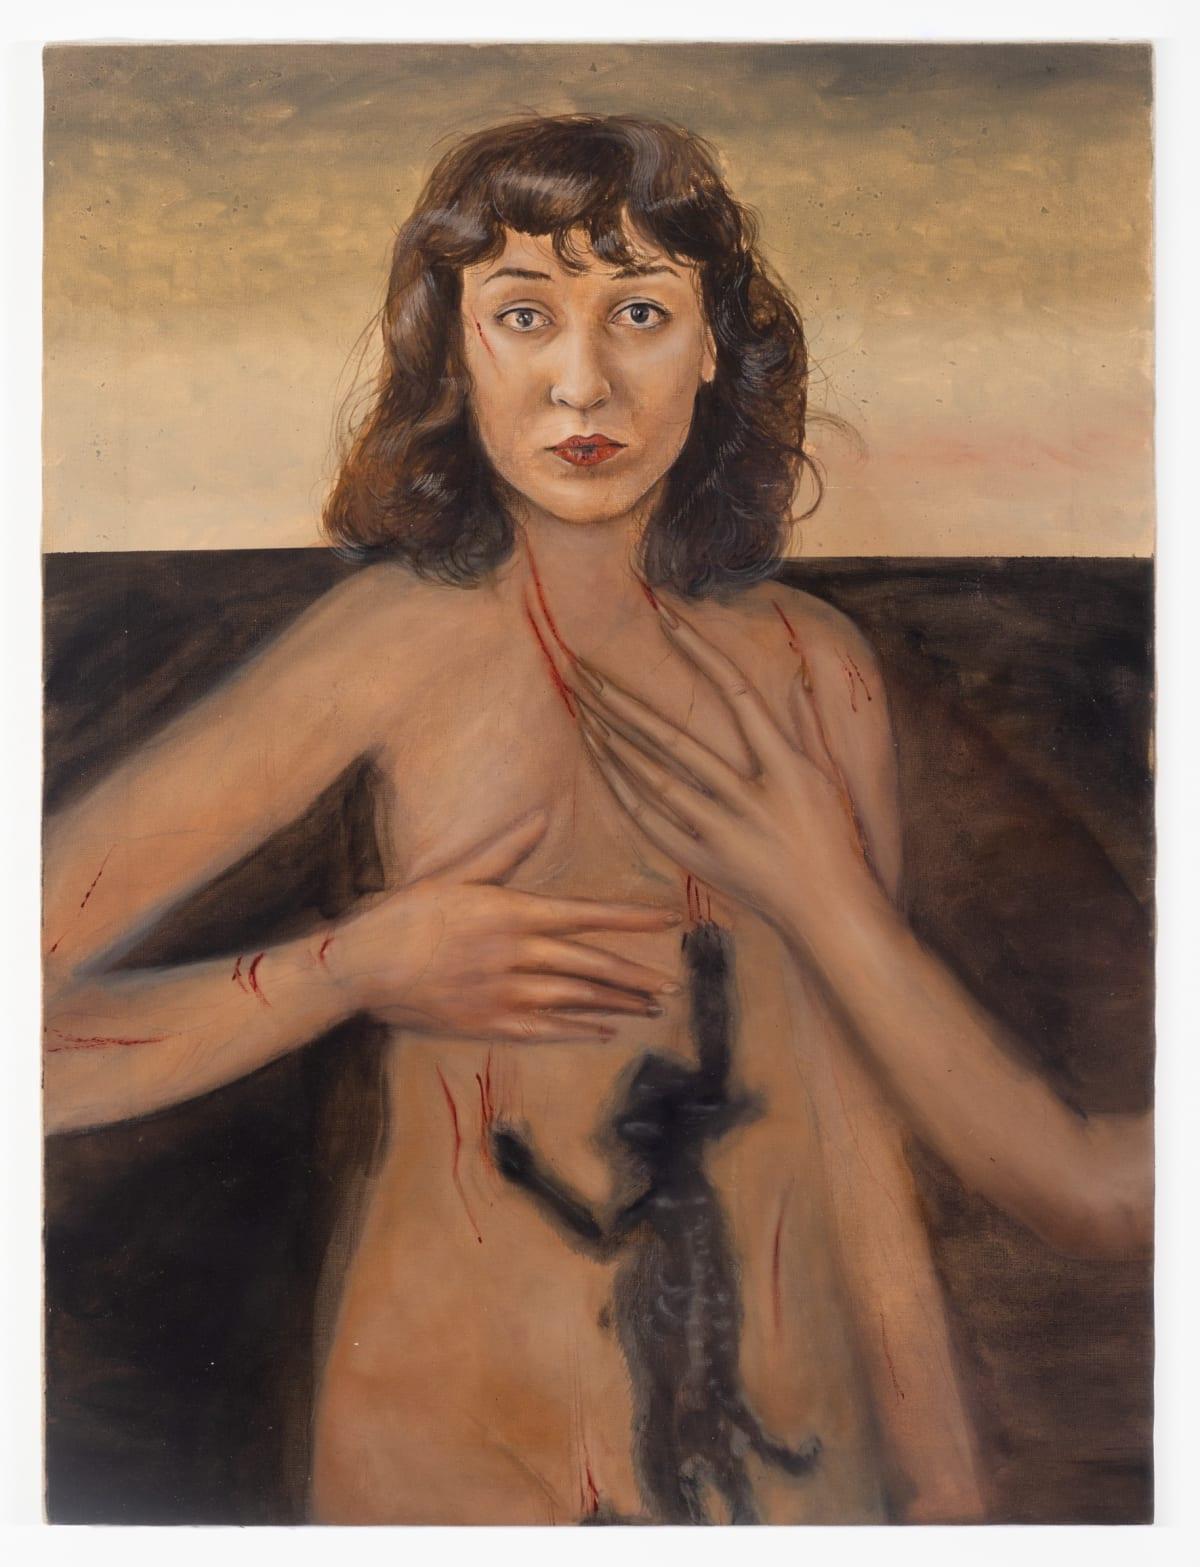 Agata Slowak, Self-portrait with little cat, 2021, Oil on canvas 31 1/2 x 23 5/8 in, 80 x 60 cm